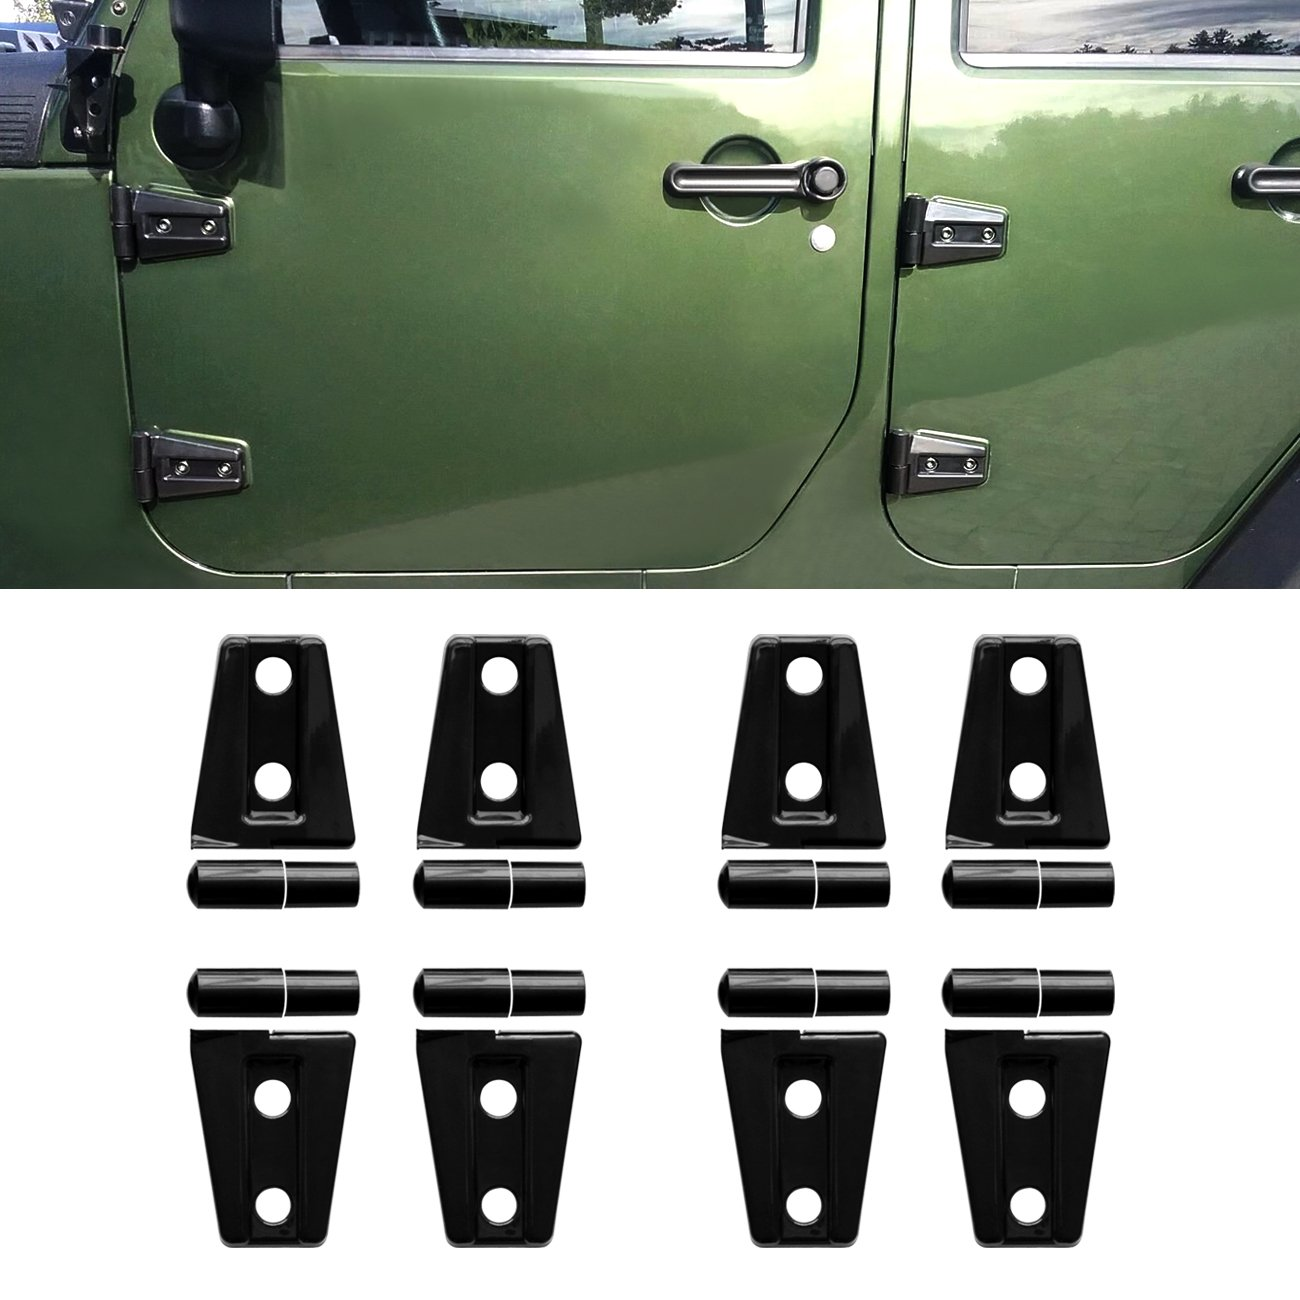 Diytunings 8 Pcs Black Door Hinge Cover Trim For 4 Jeep Parts Wrangler Jk Jku Unlimited